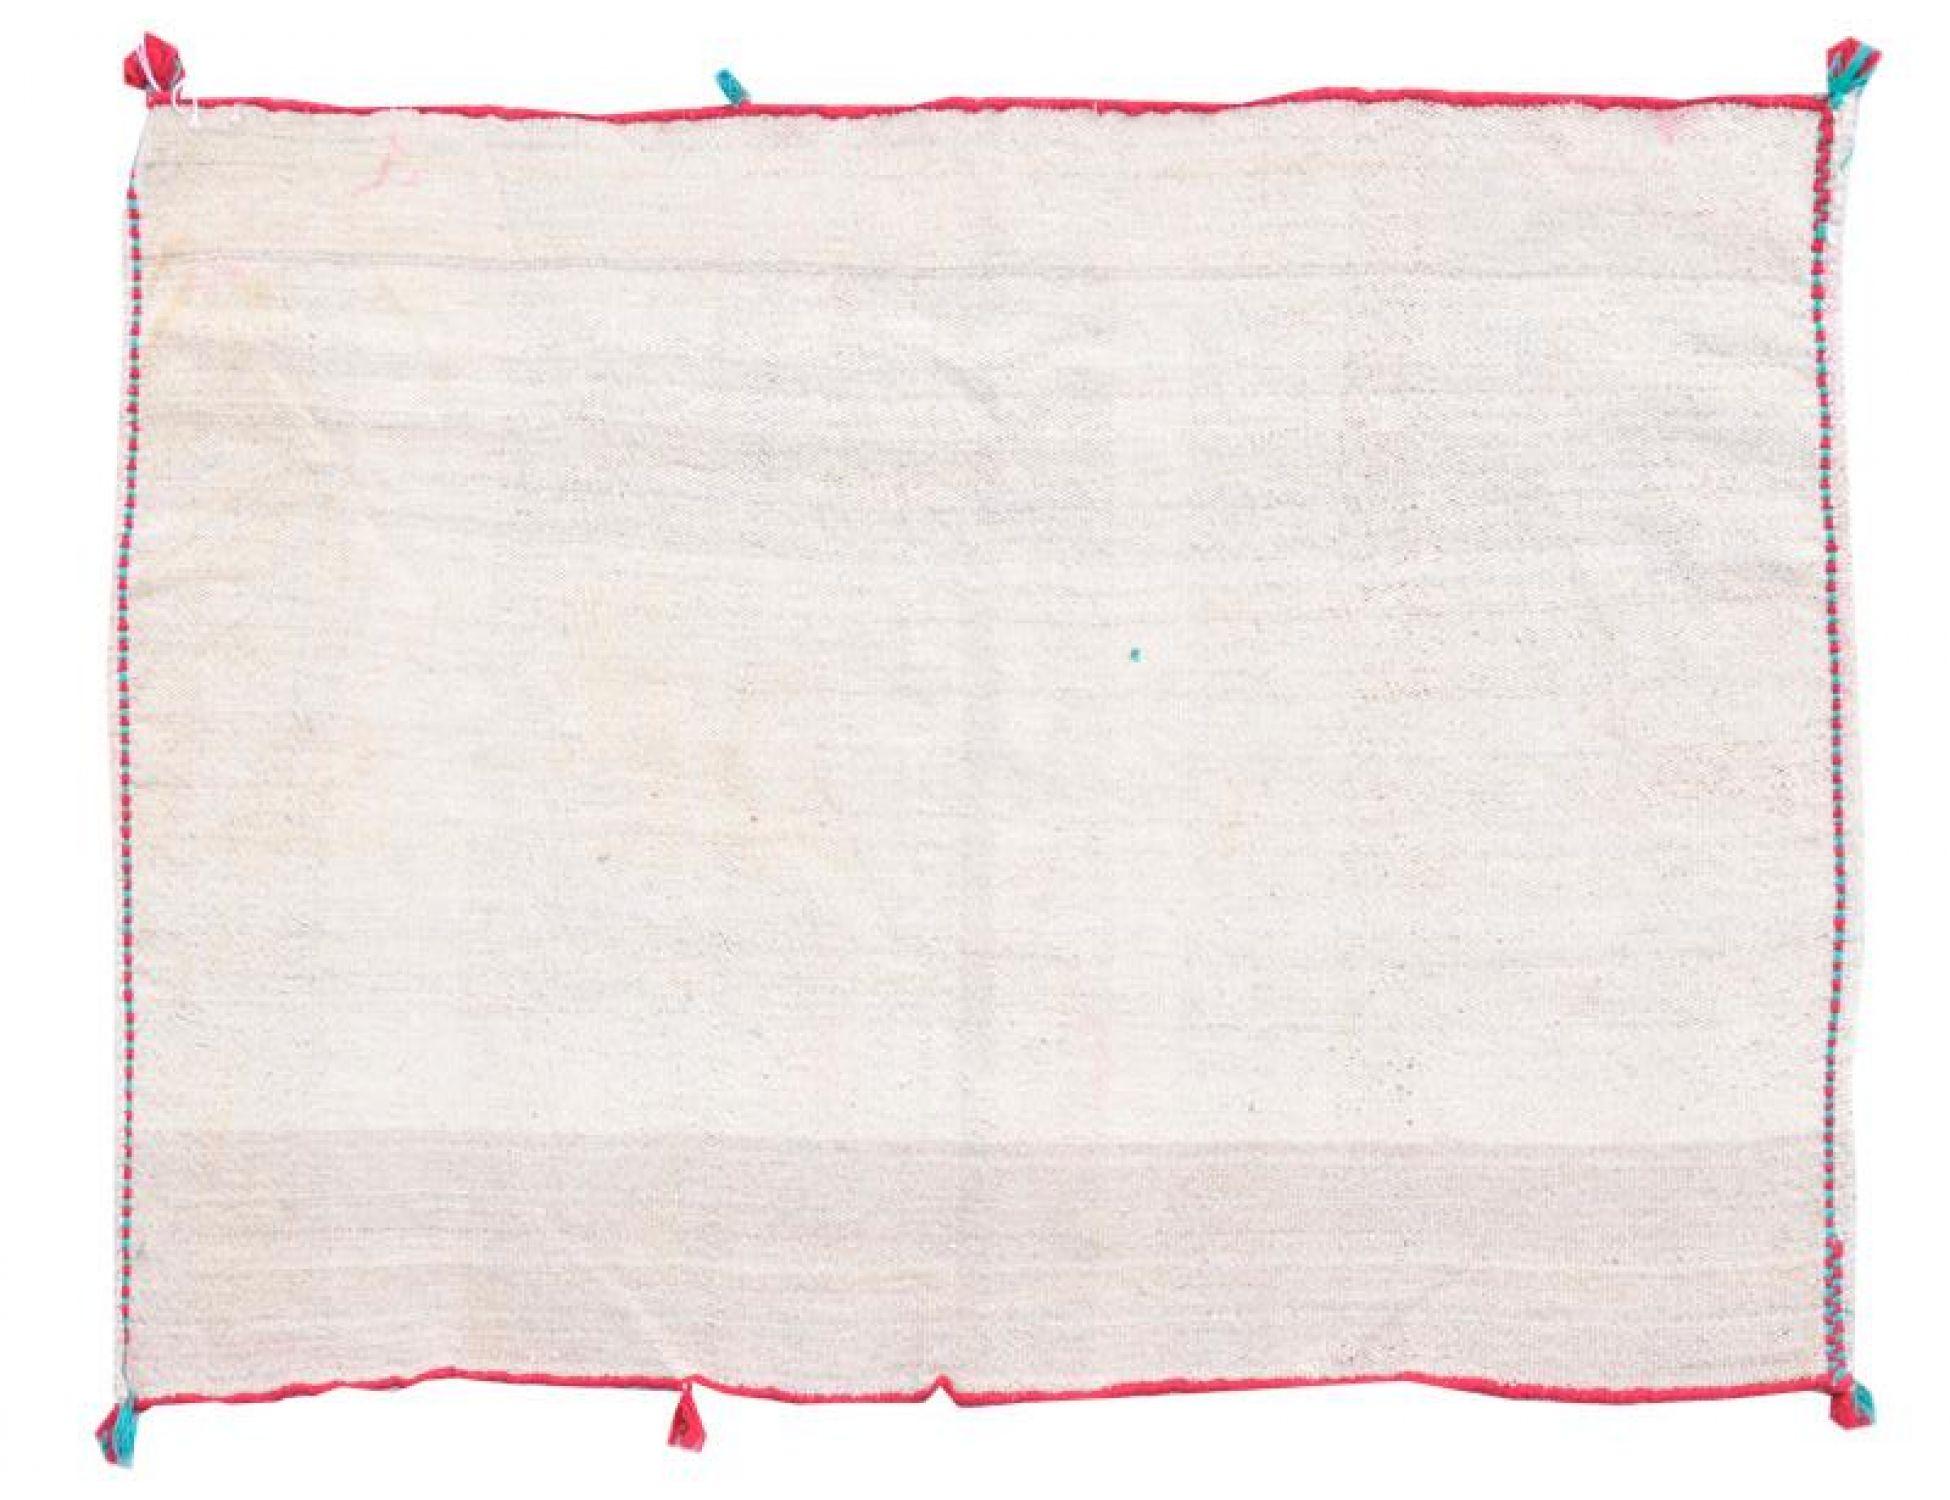 PERSIAN WOOL KILIMS   <br/>154 x 95 cm